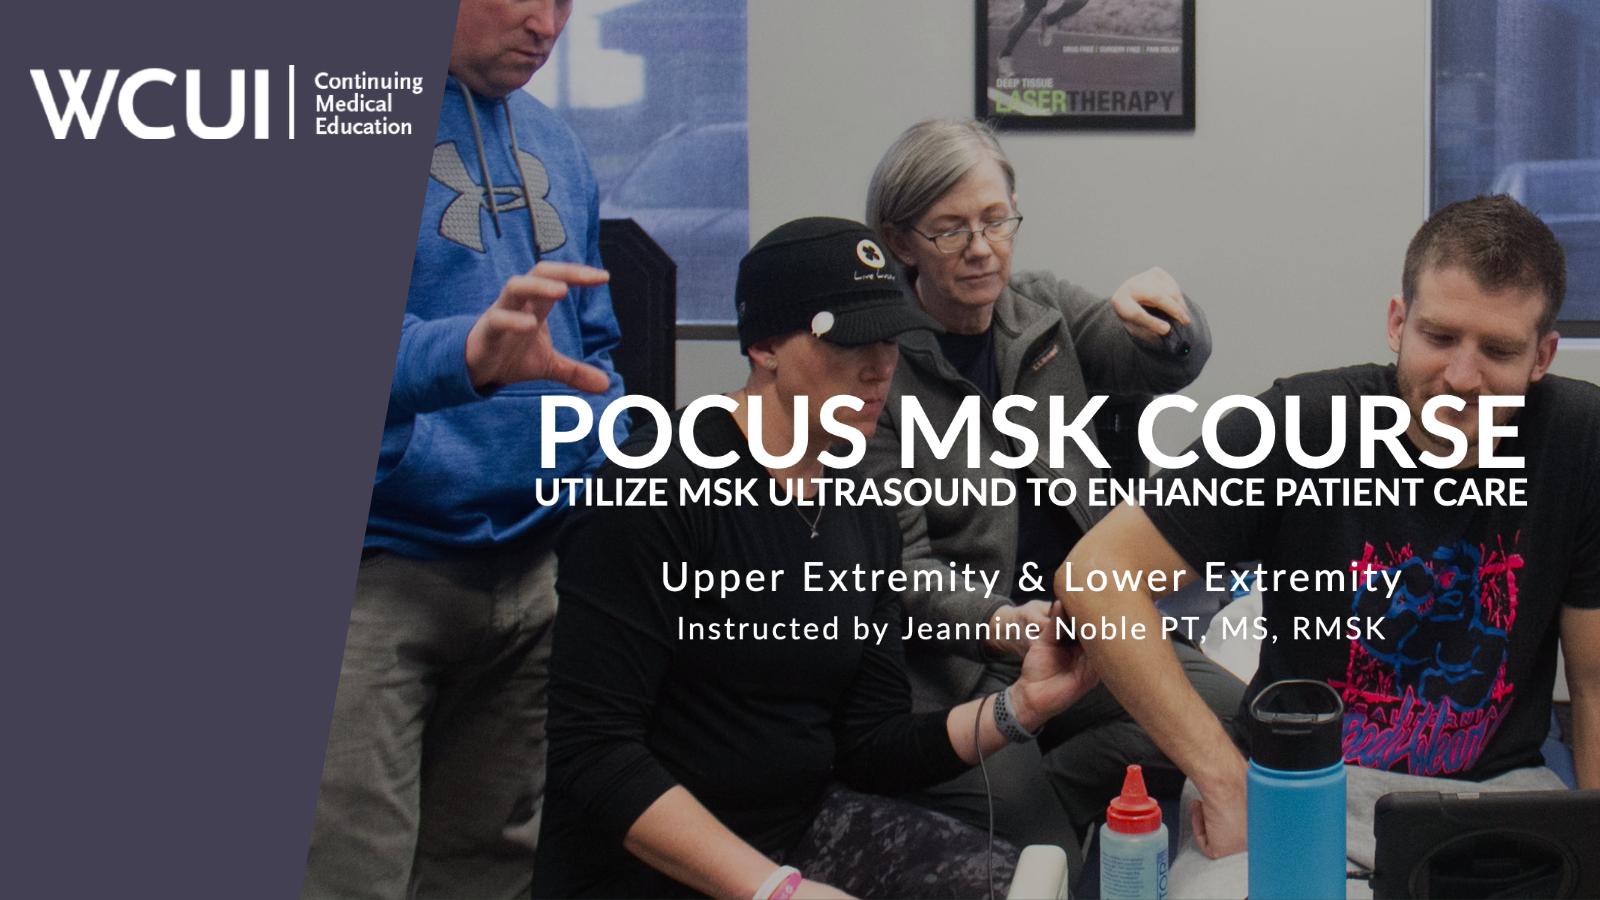 POCUS MSK Course